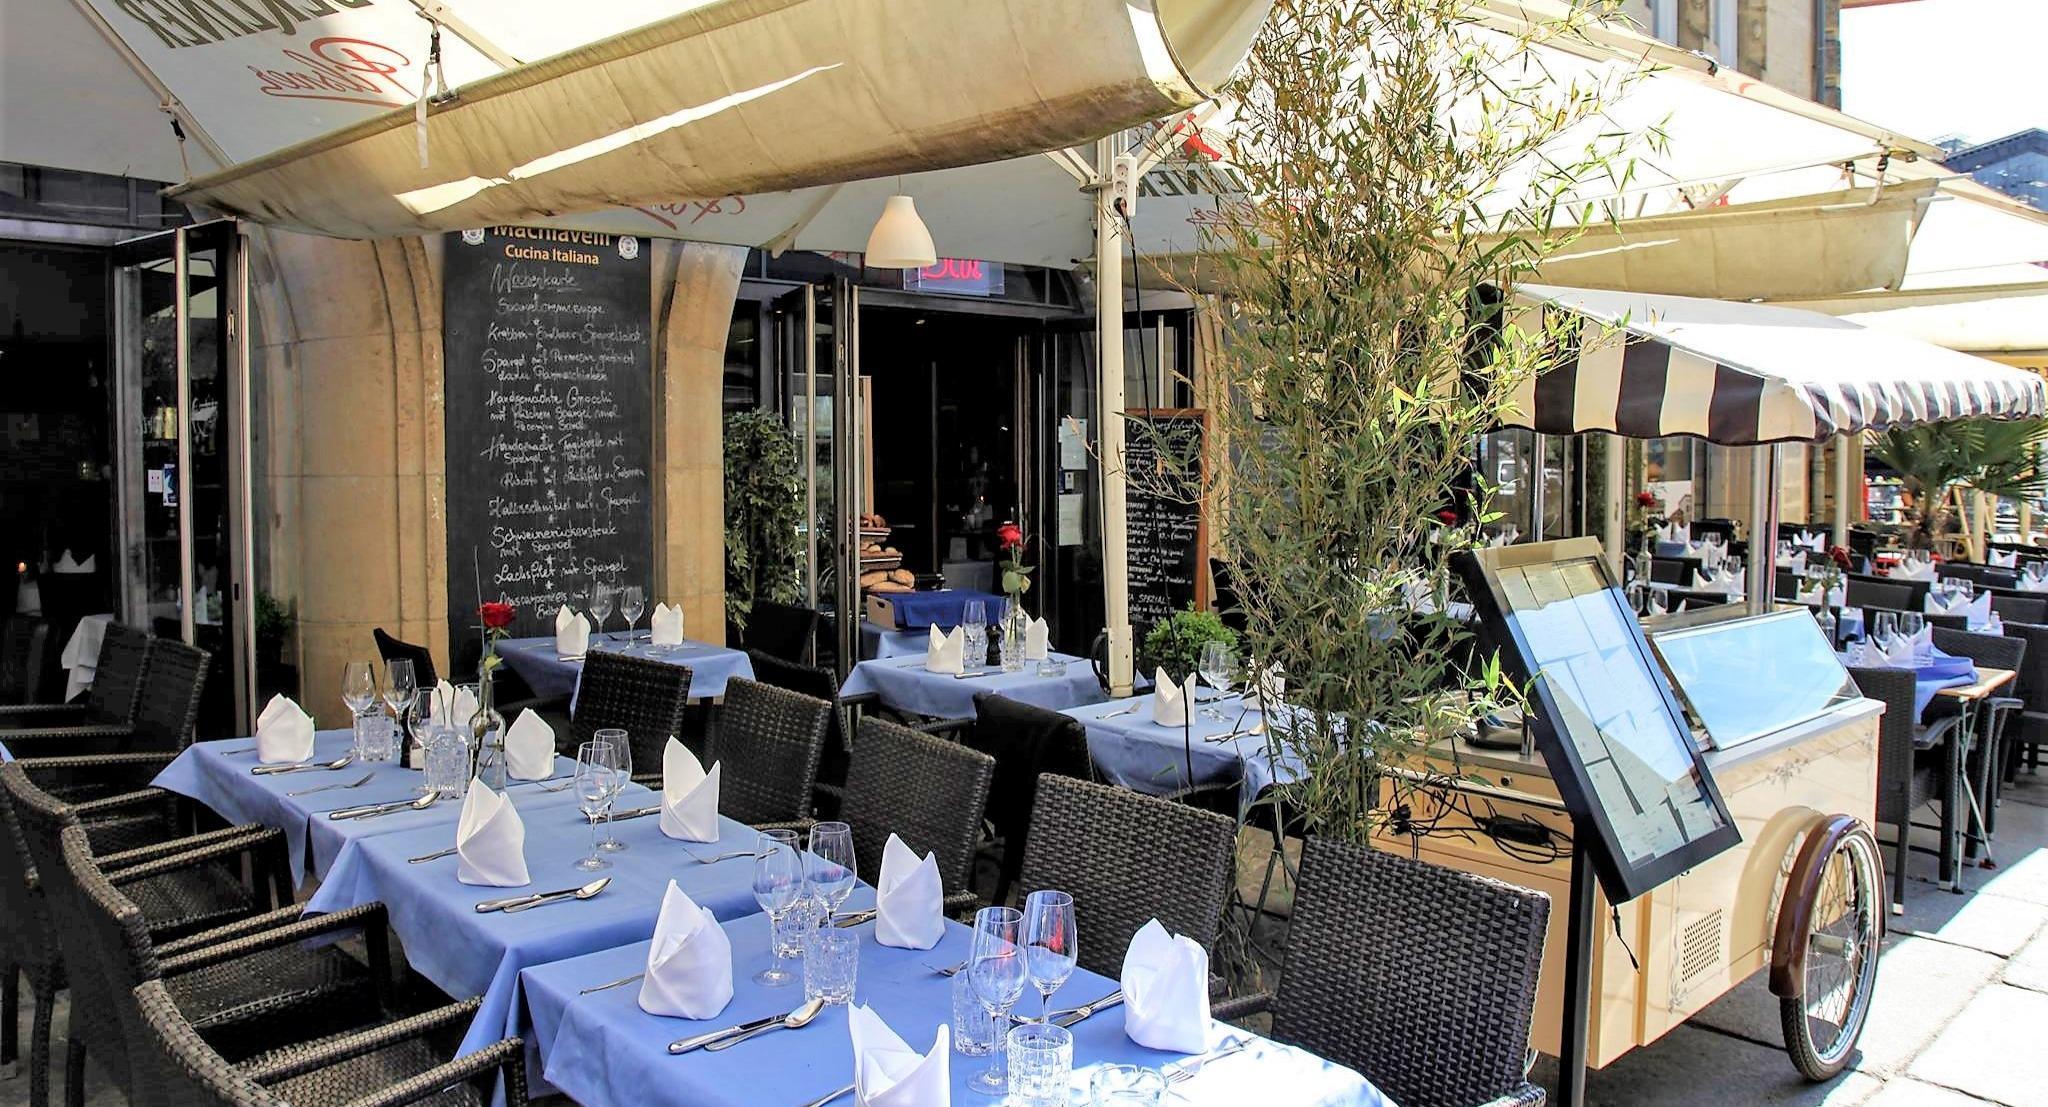 Restaurant Machiavelli in Berlin – speisekarte.de